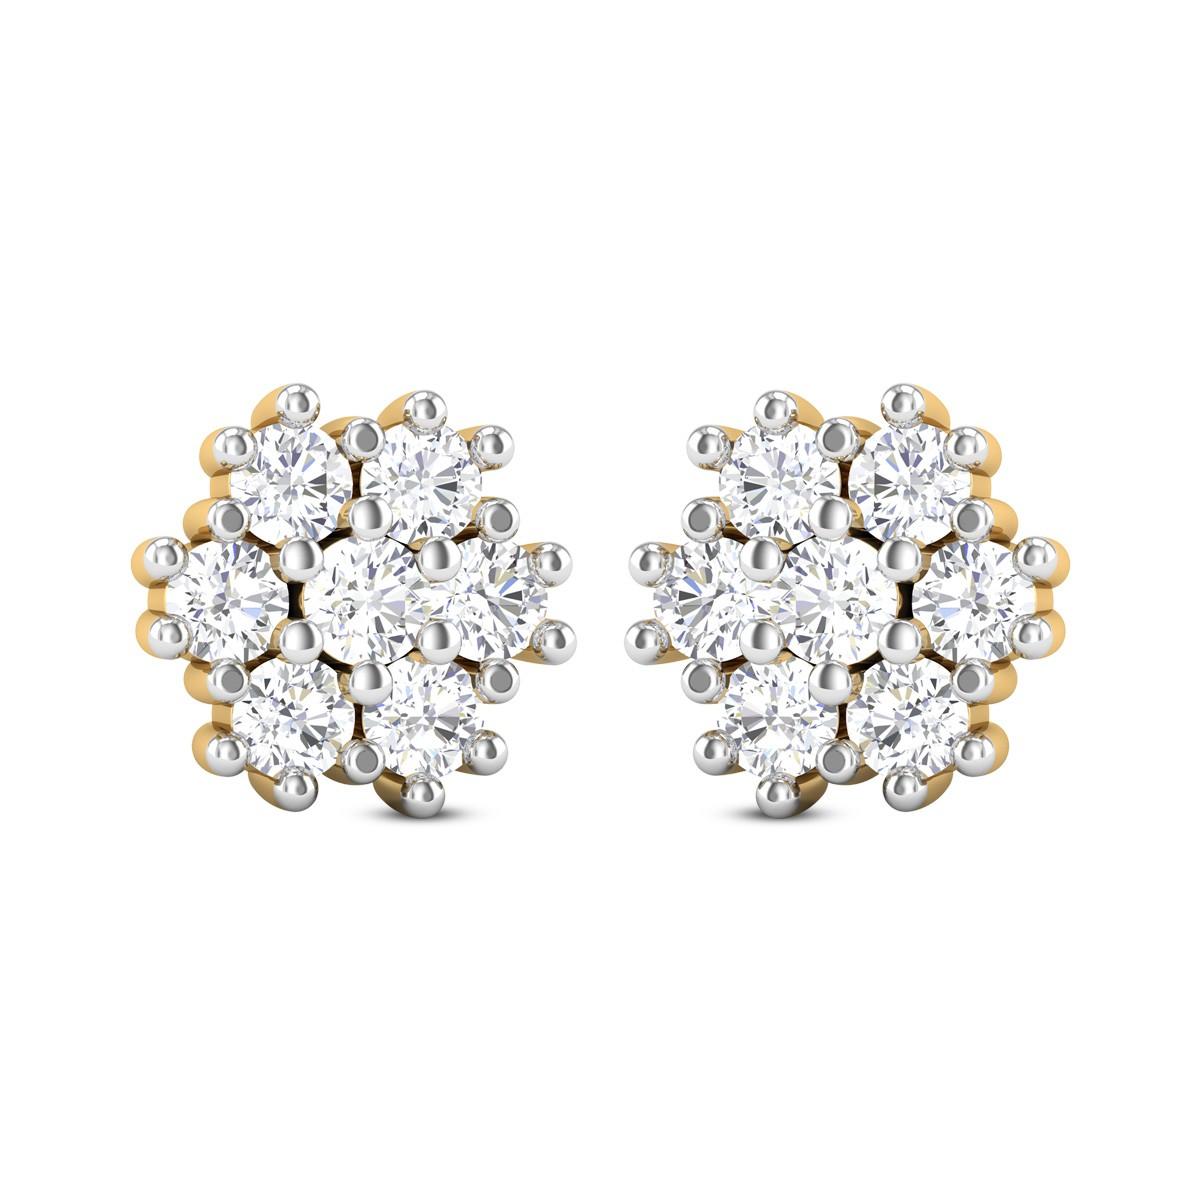 Albany Diamond Earrings